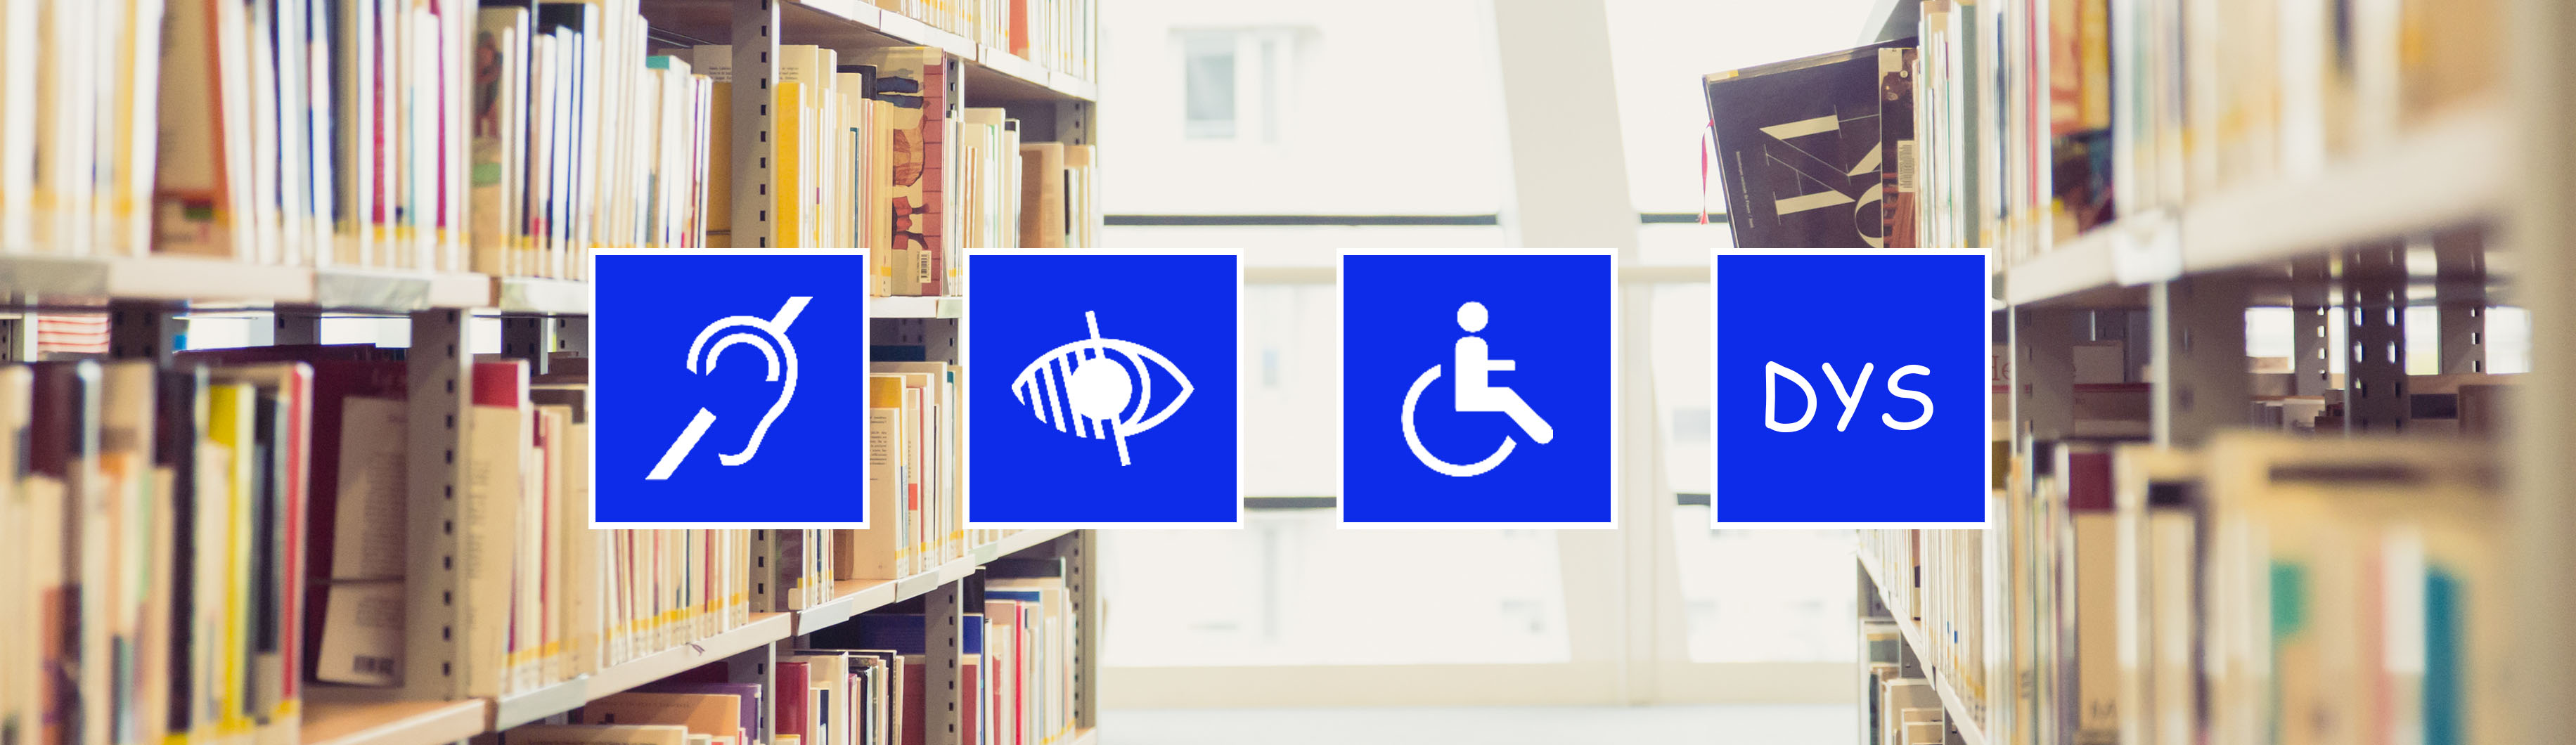 Bandeau avec quatre pictogrammes handicap